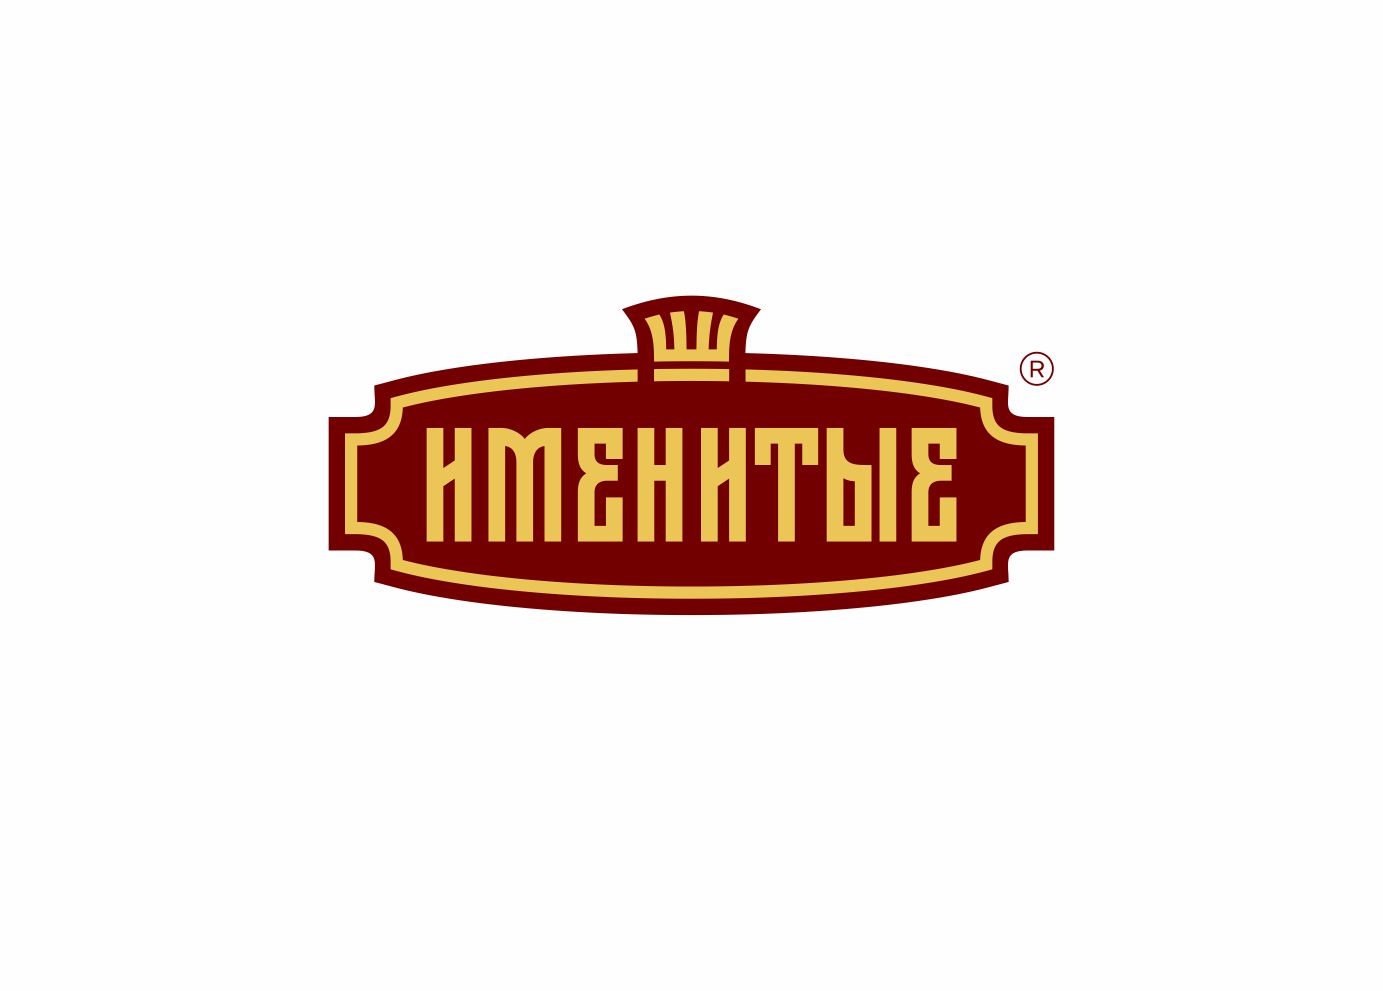 Логотип и фирменный стиль продуктов питания фото f_7435bb594d47724b.png